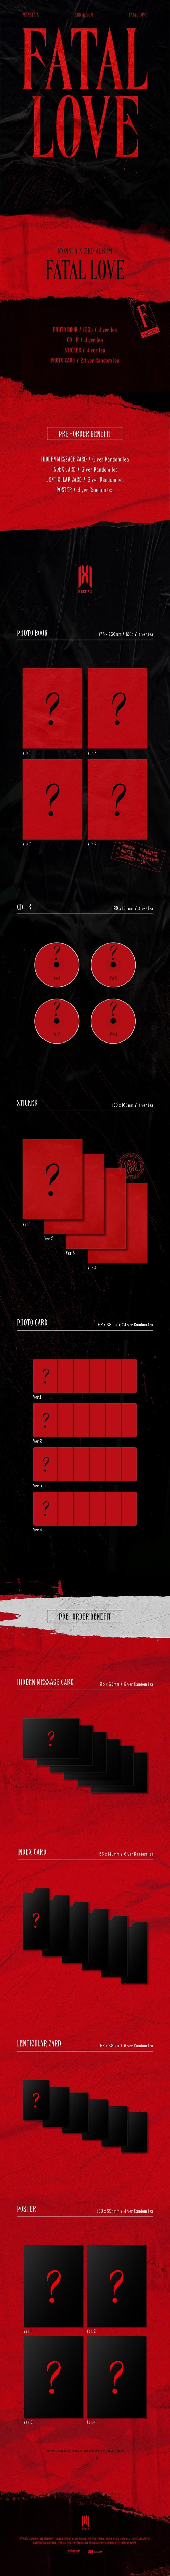 MONSTA X - Vol.3 [FATAL LOVE] + Poster & POB